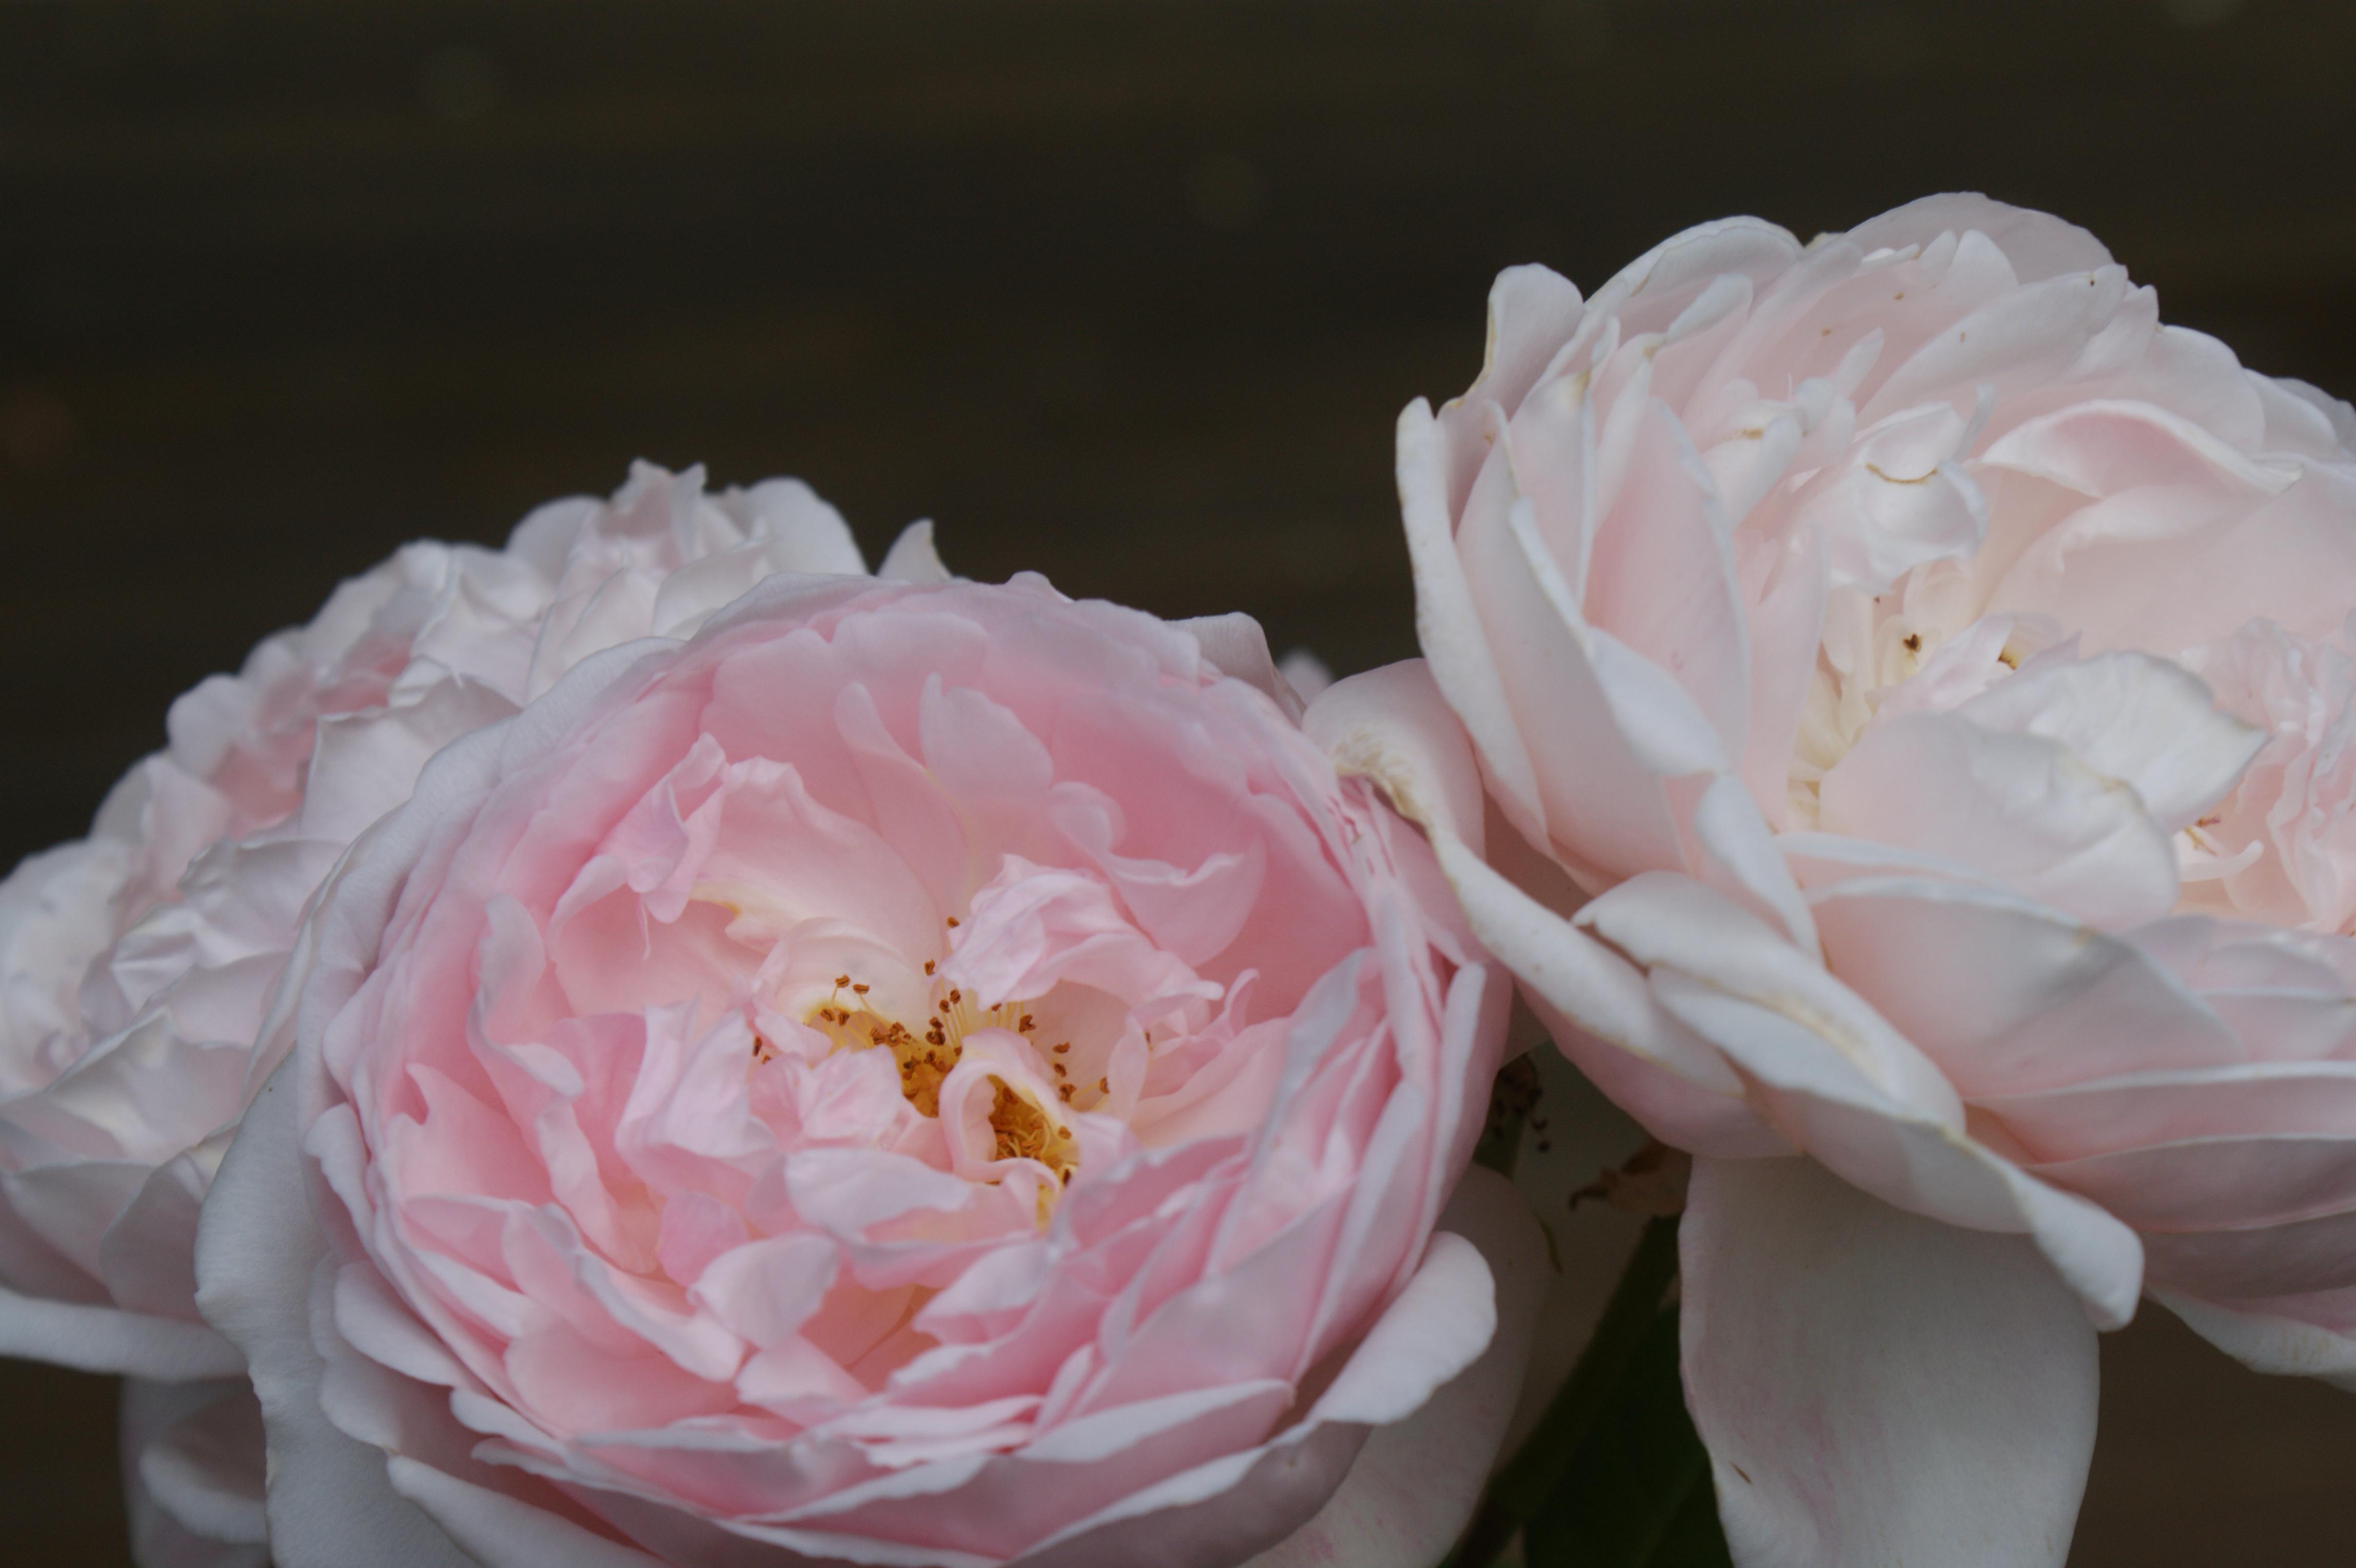 ericvale_roses_tasmanian_rose_gardens_4